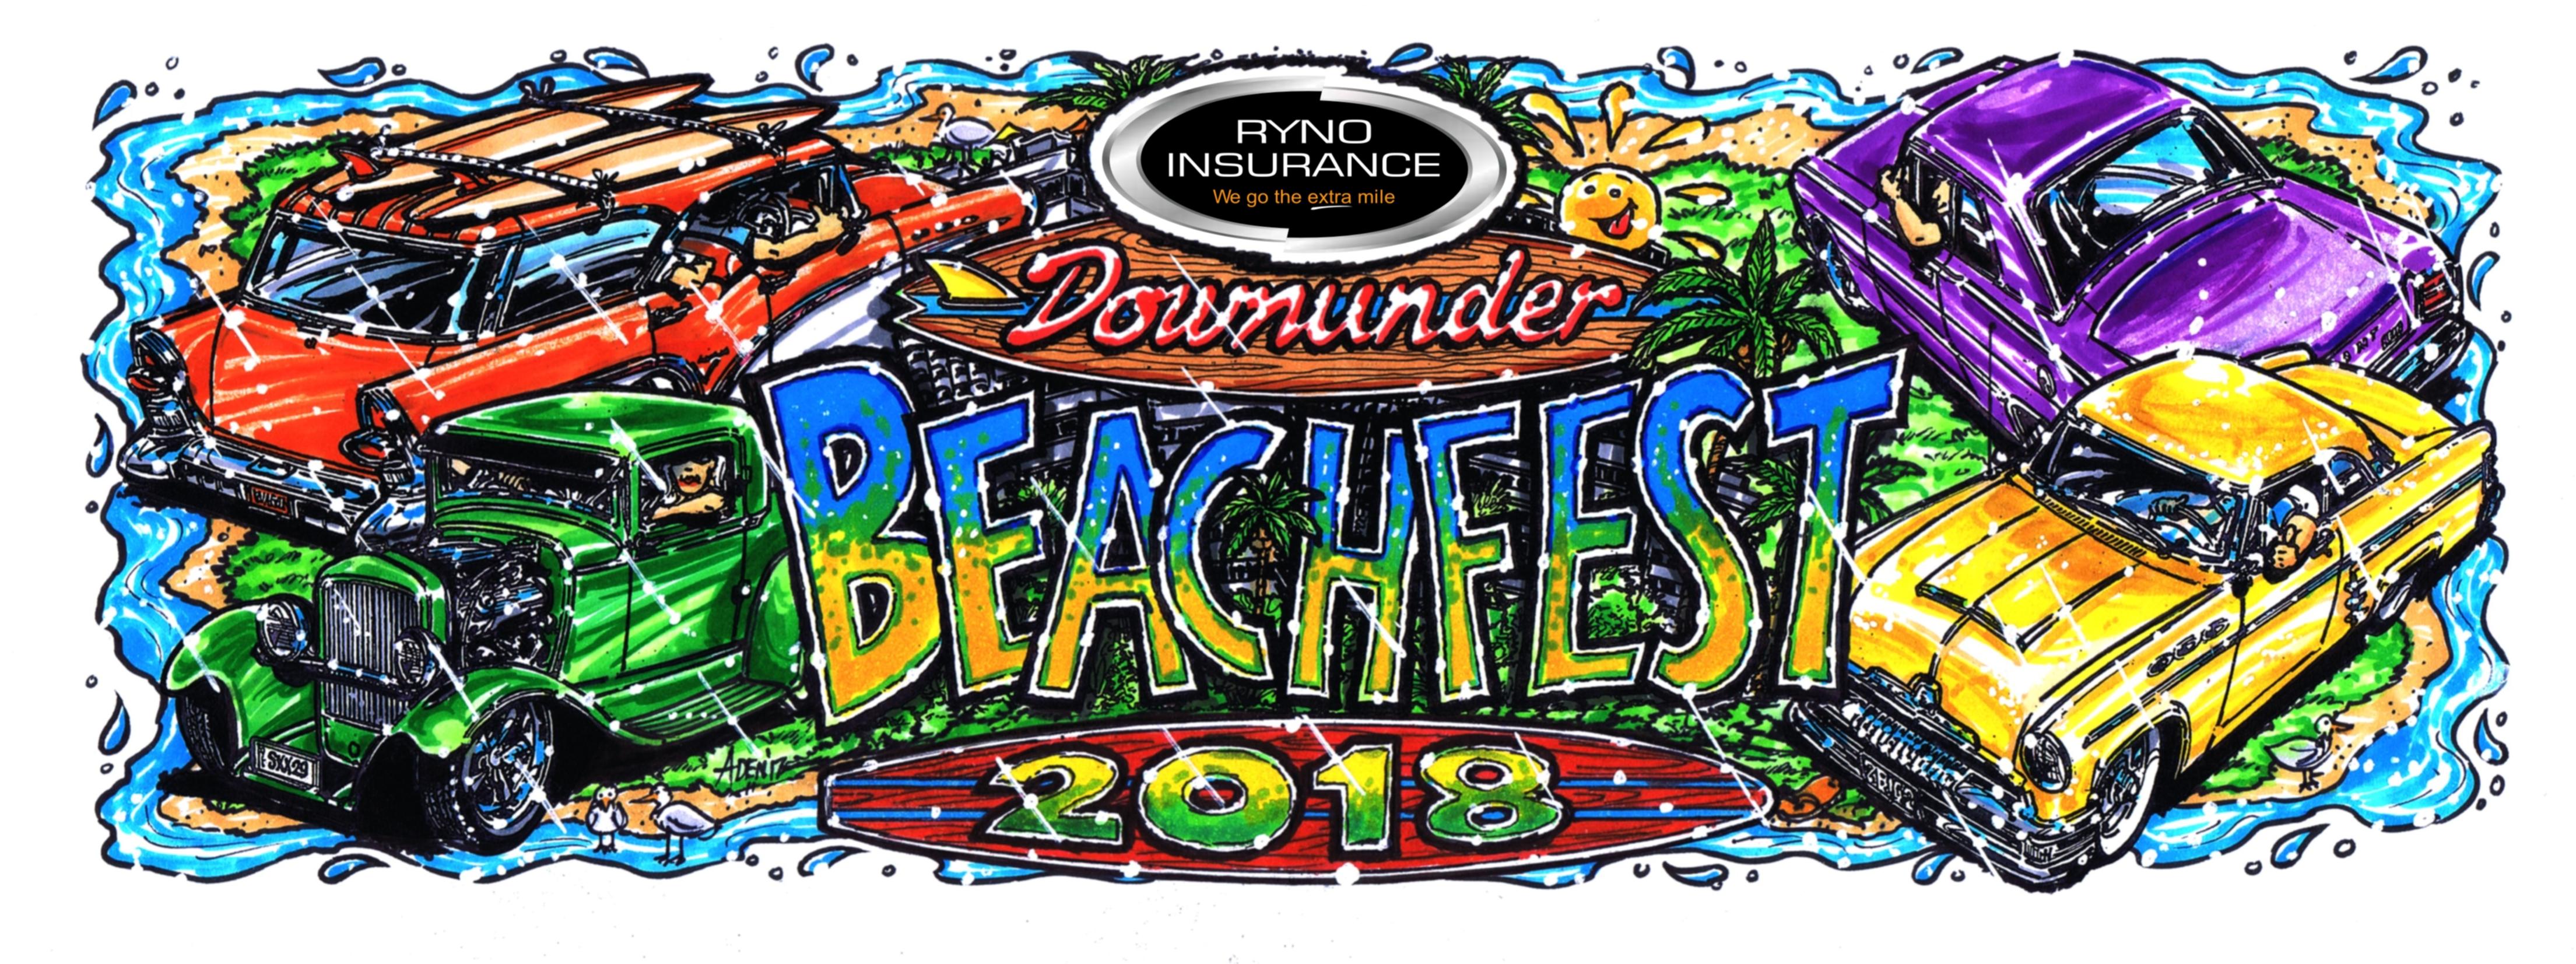 Beachfest downunder Ryno insurance